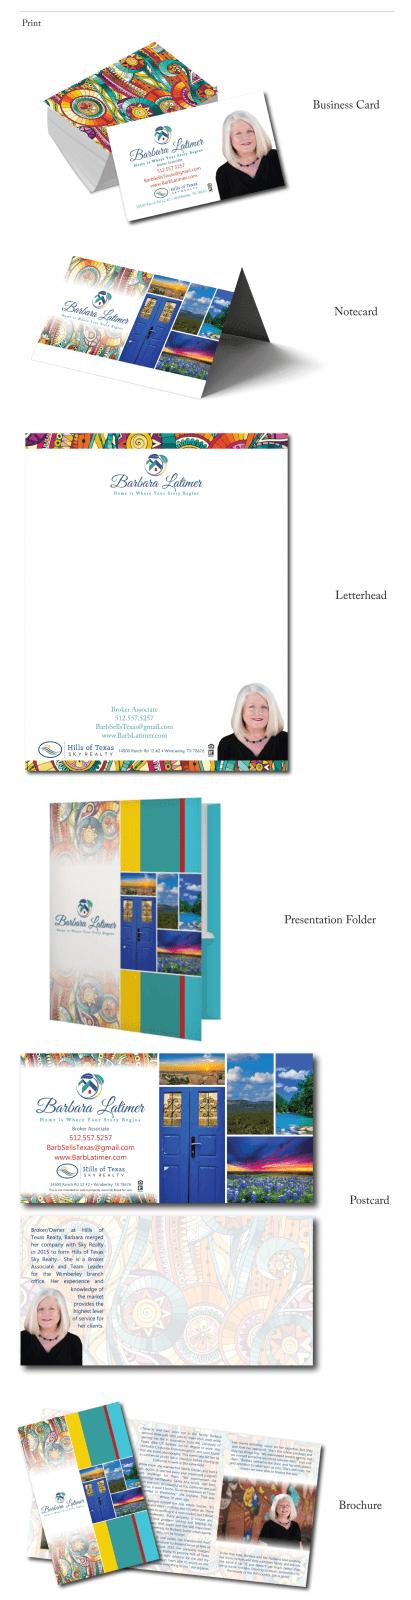 Design-Board-Web---Barbara-Latimer_04